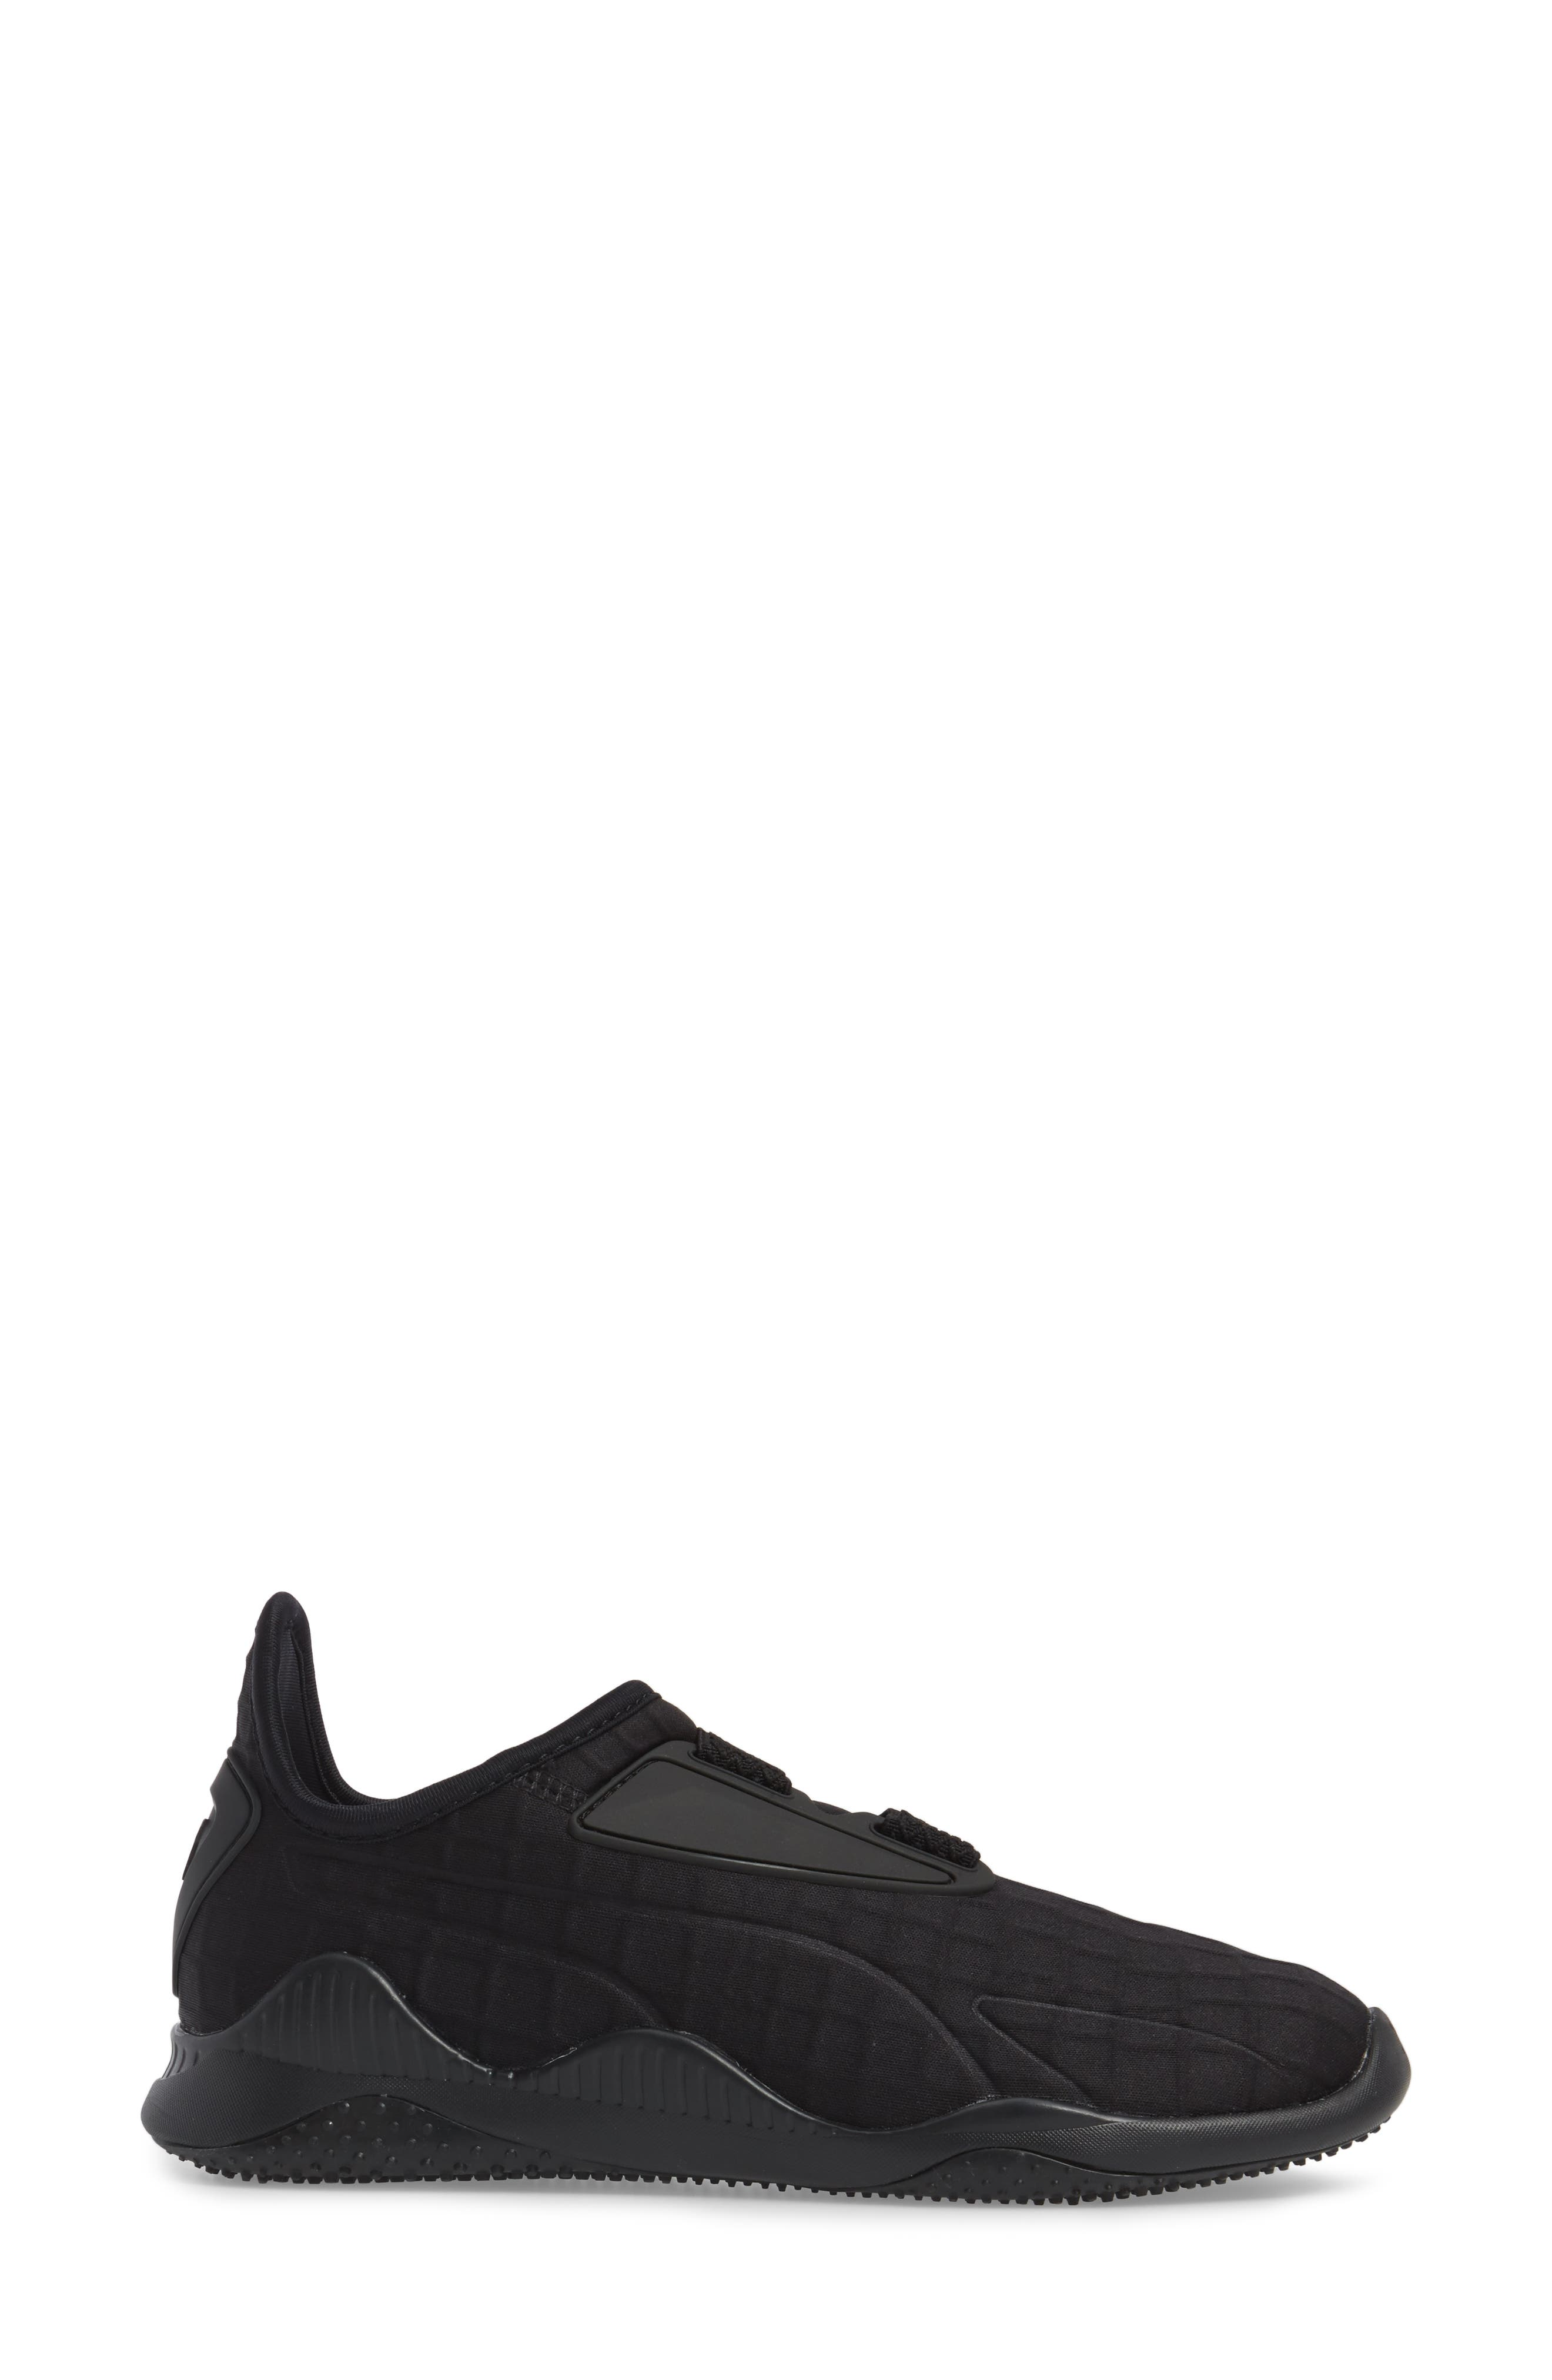 Mostro Fashion Sneaker,                             Alternate thumbnail 3, color,                             Puma Black/ Puma Black